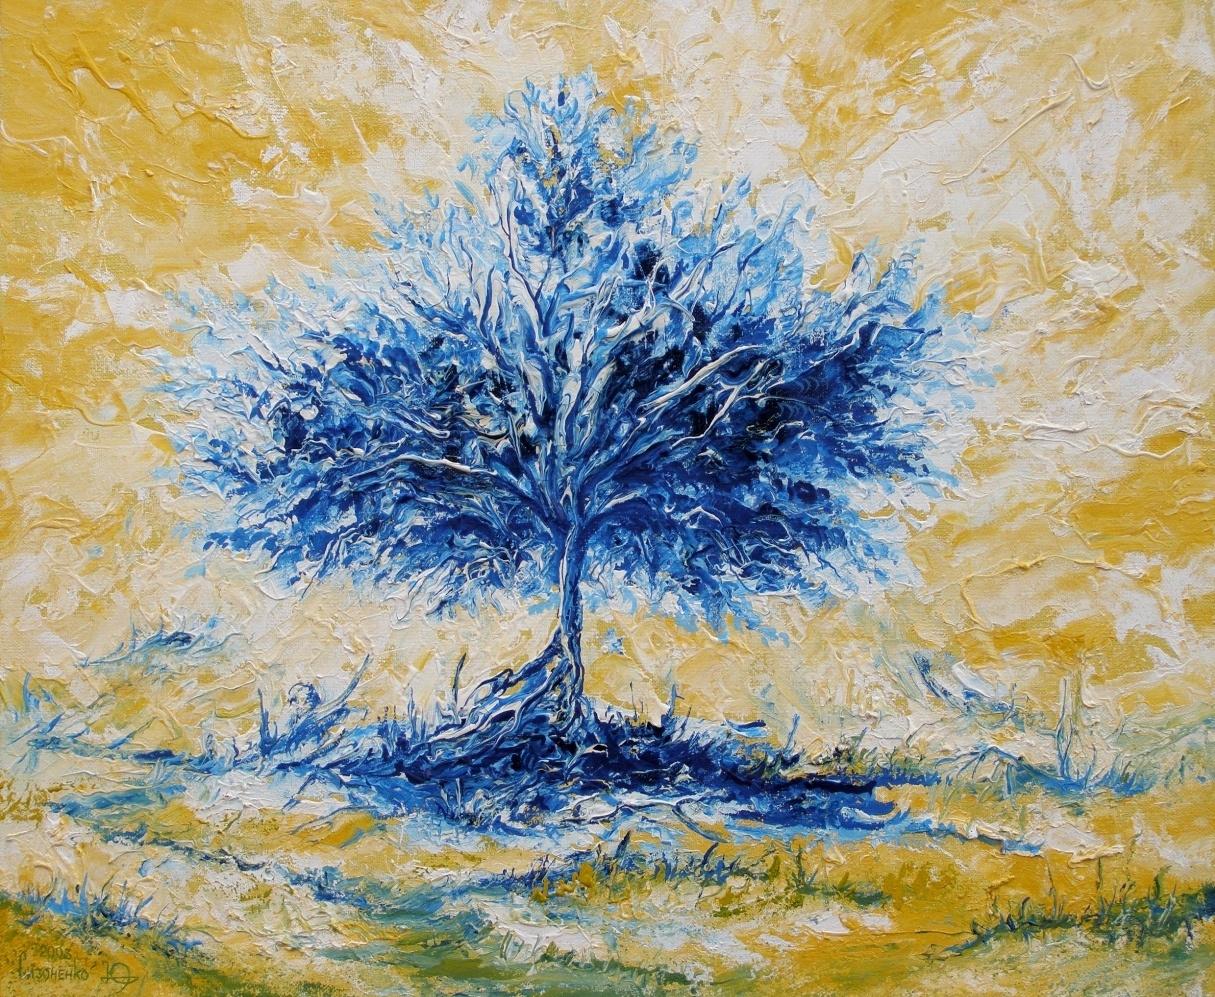 Юрий Сизоненко. Пейзаж с синим деревом.